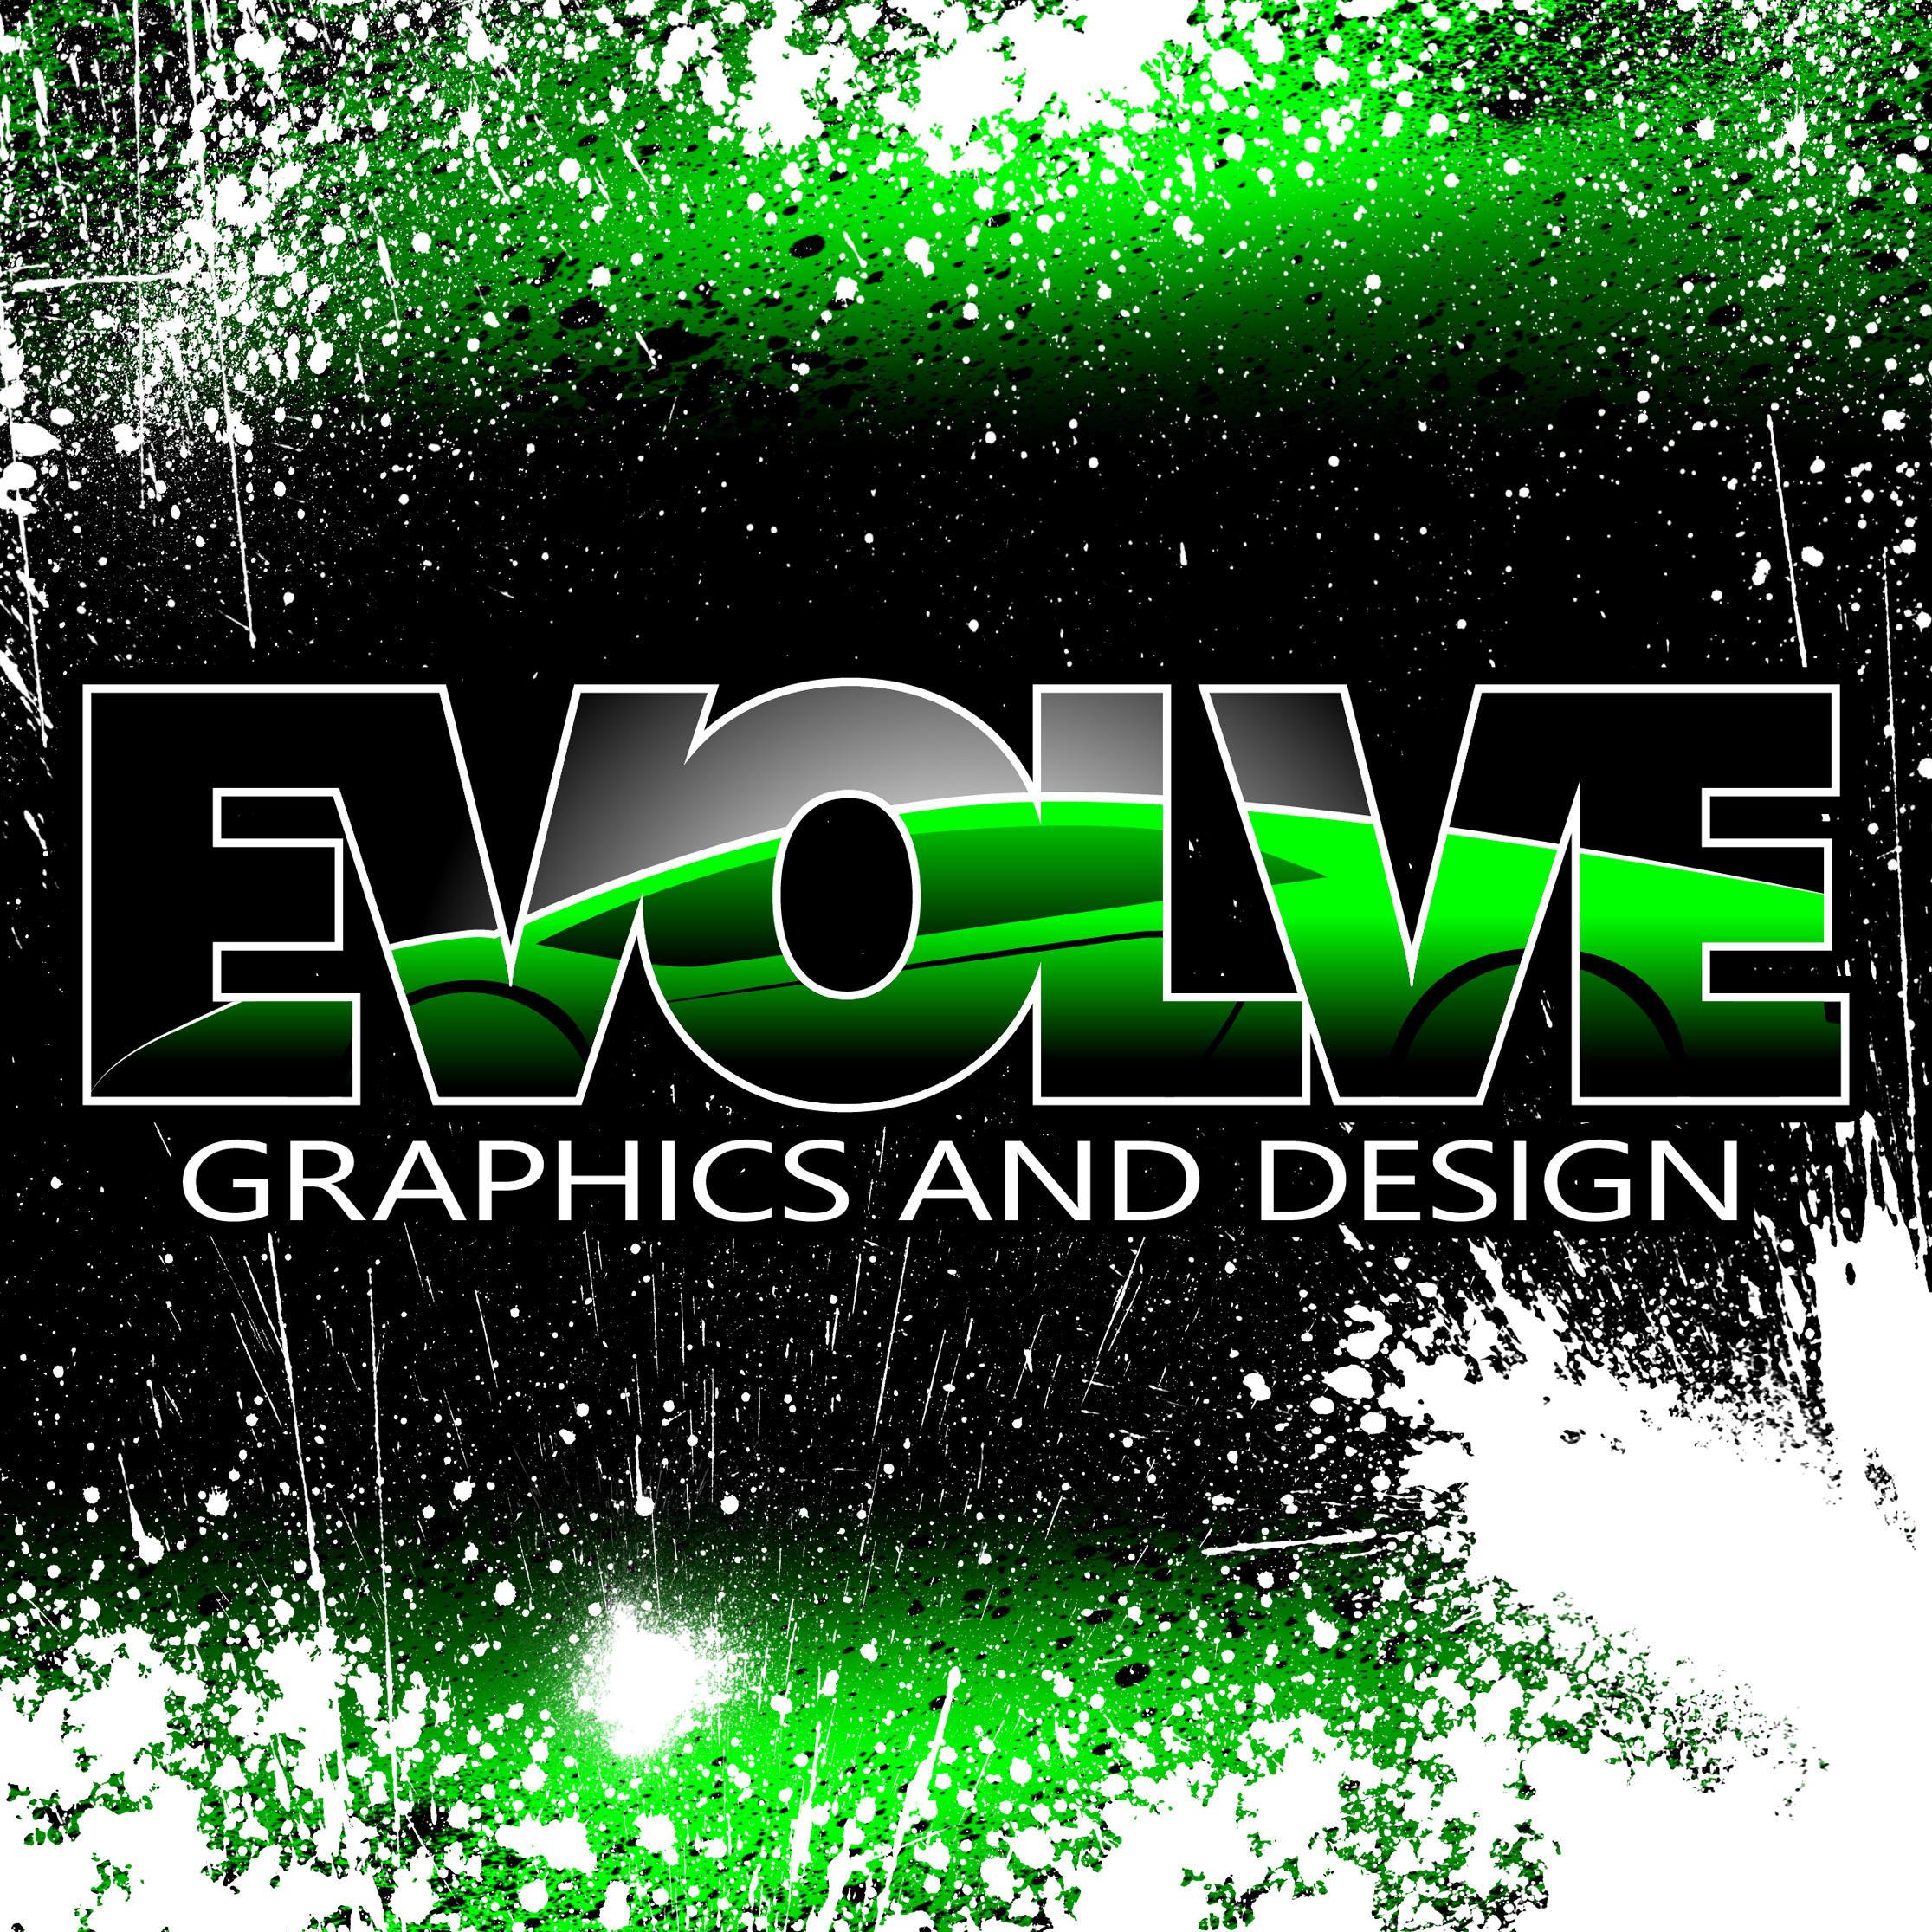 Evolve Graphics & Design